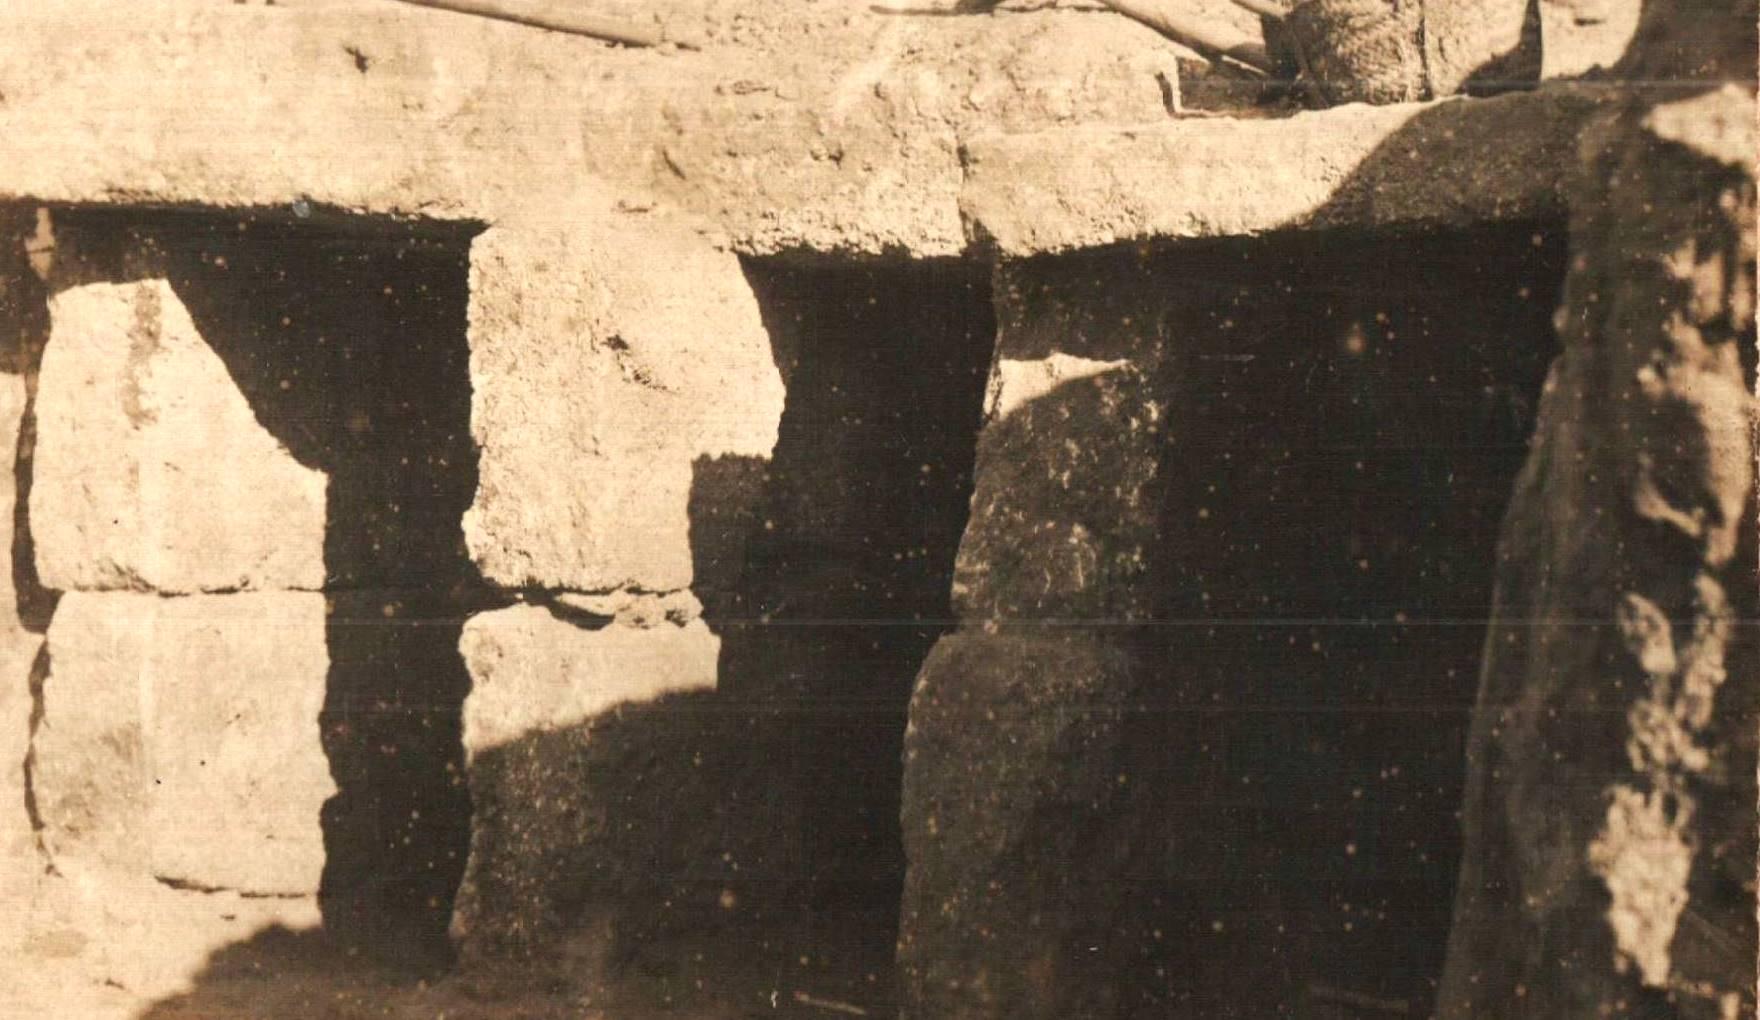 Hipogeos de la necrópolis gaditana excavados por Quintero.